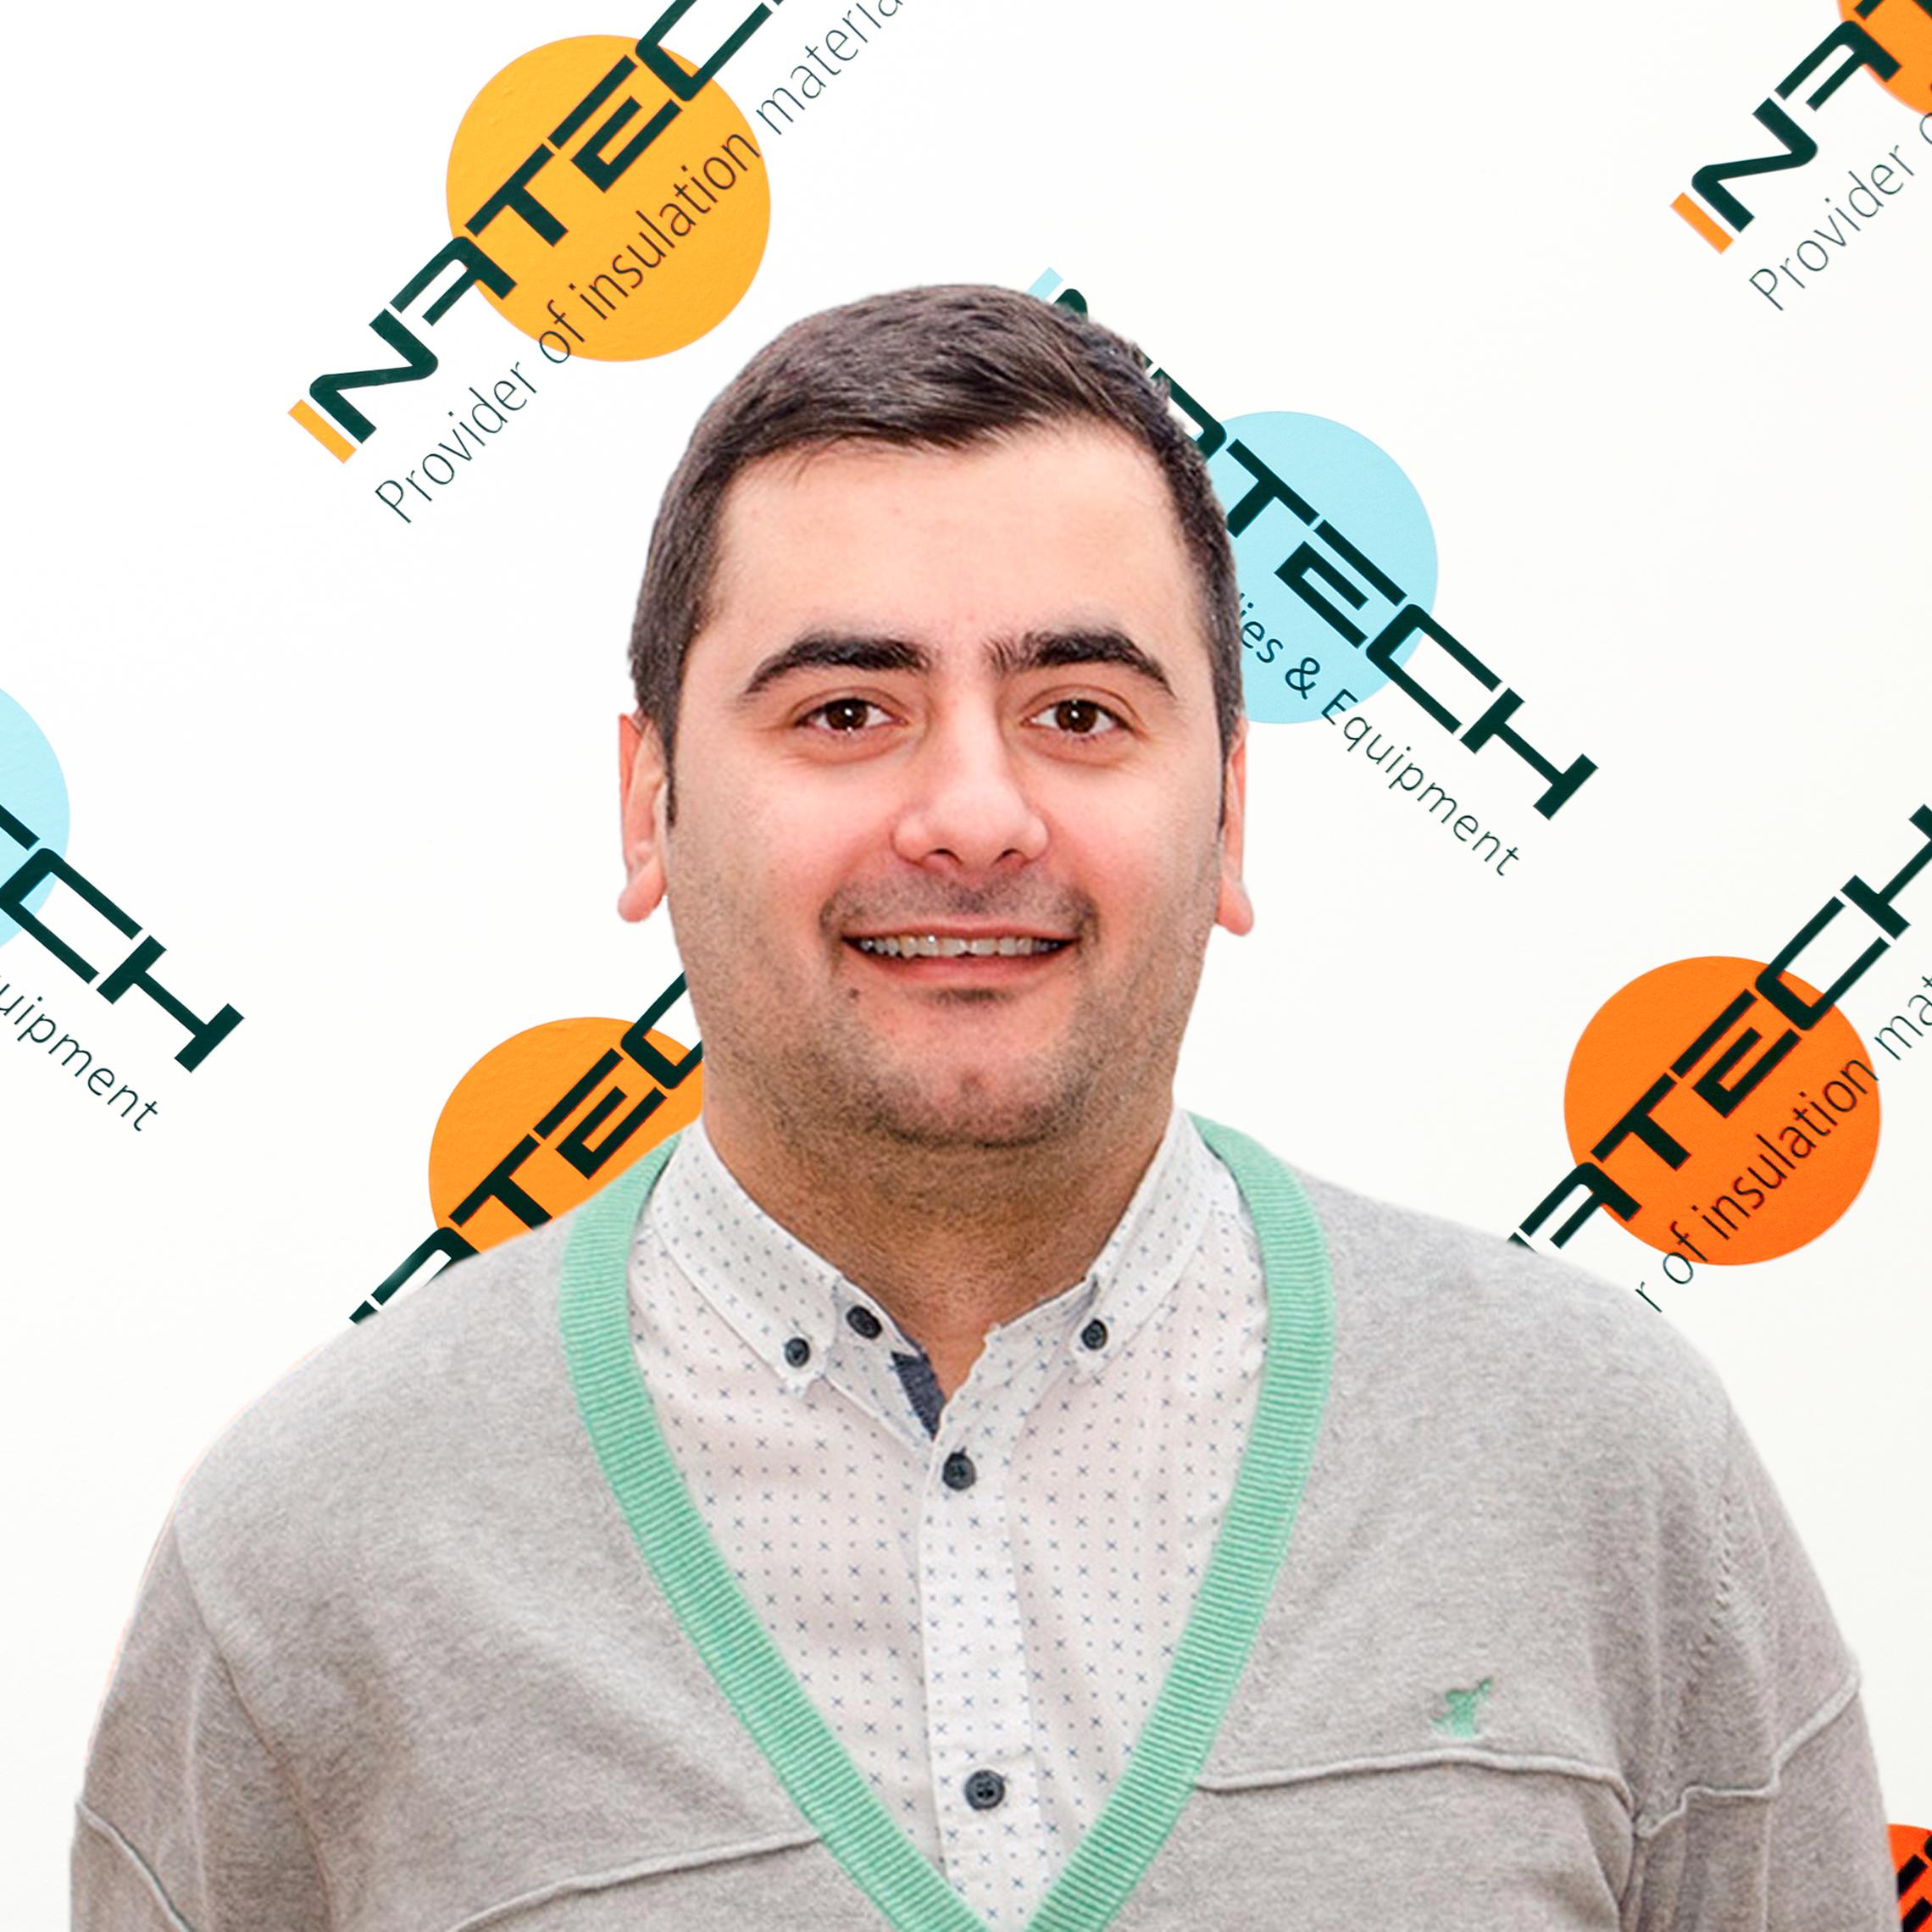 Alexandru Ghinet